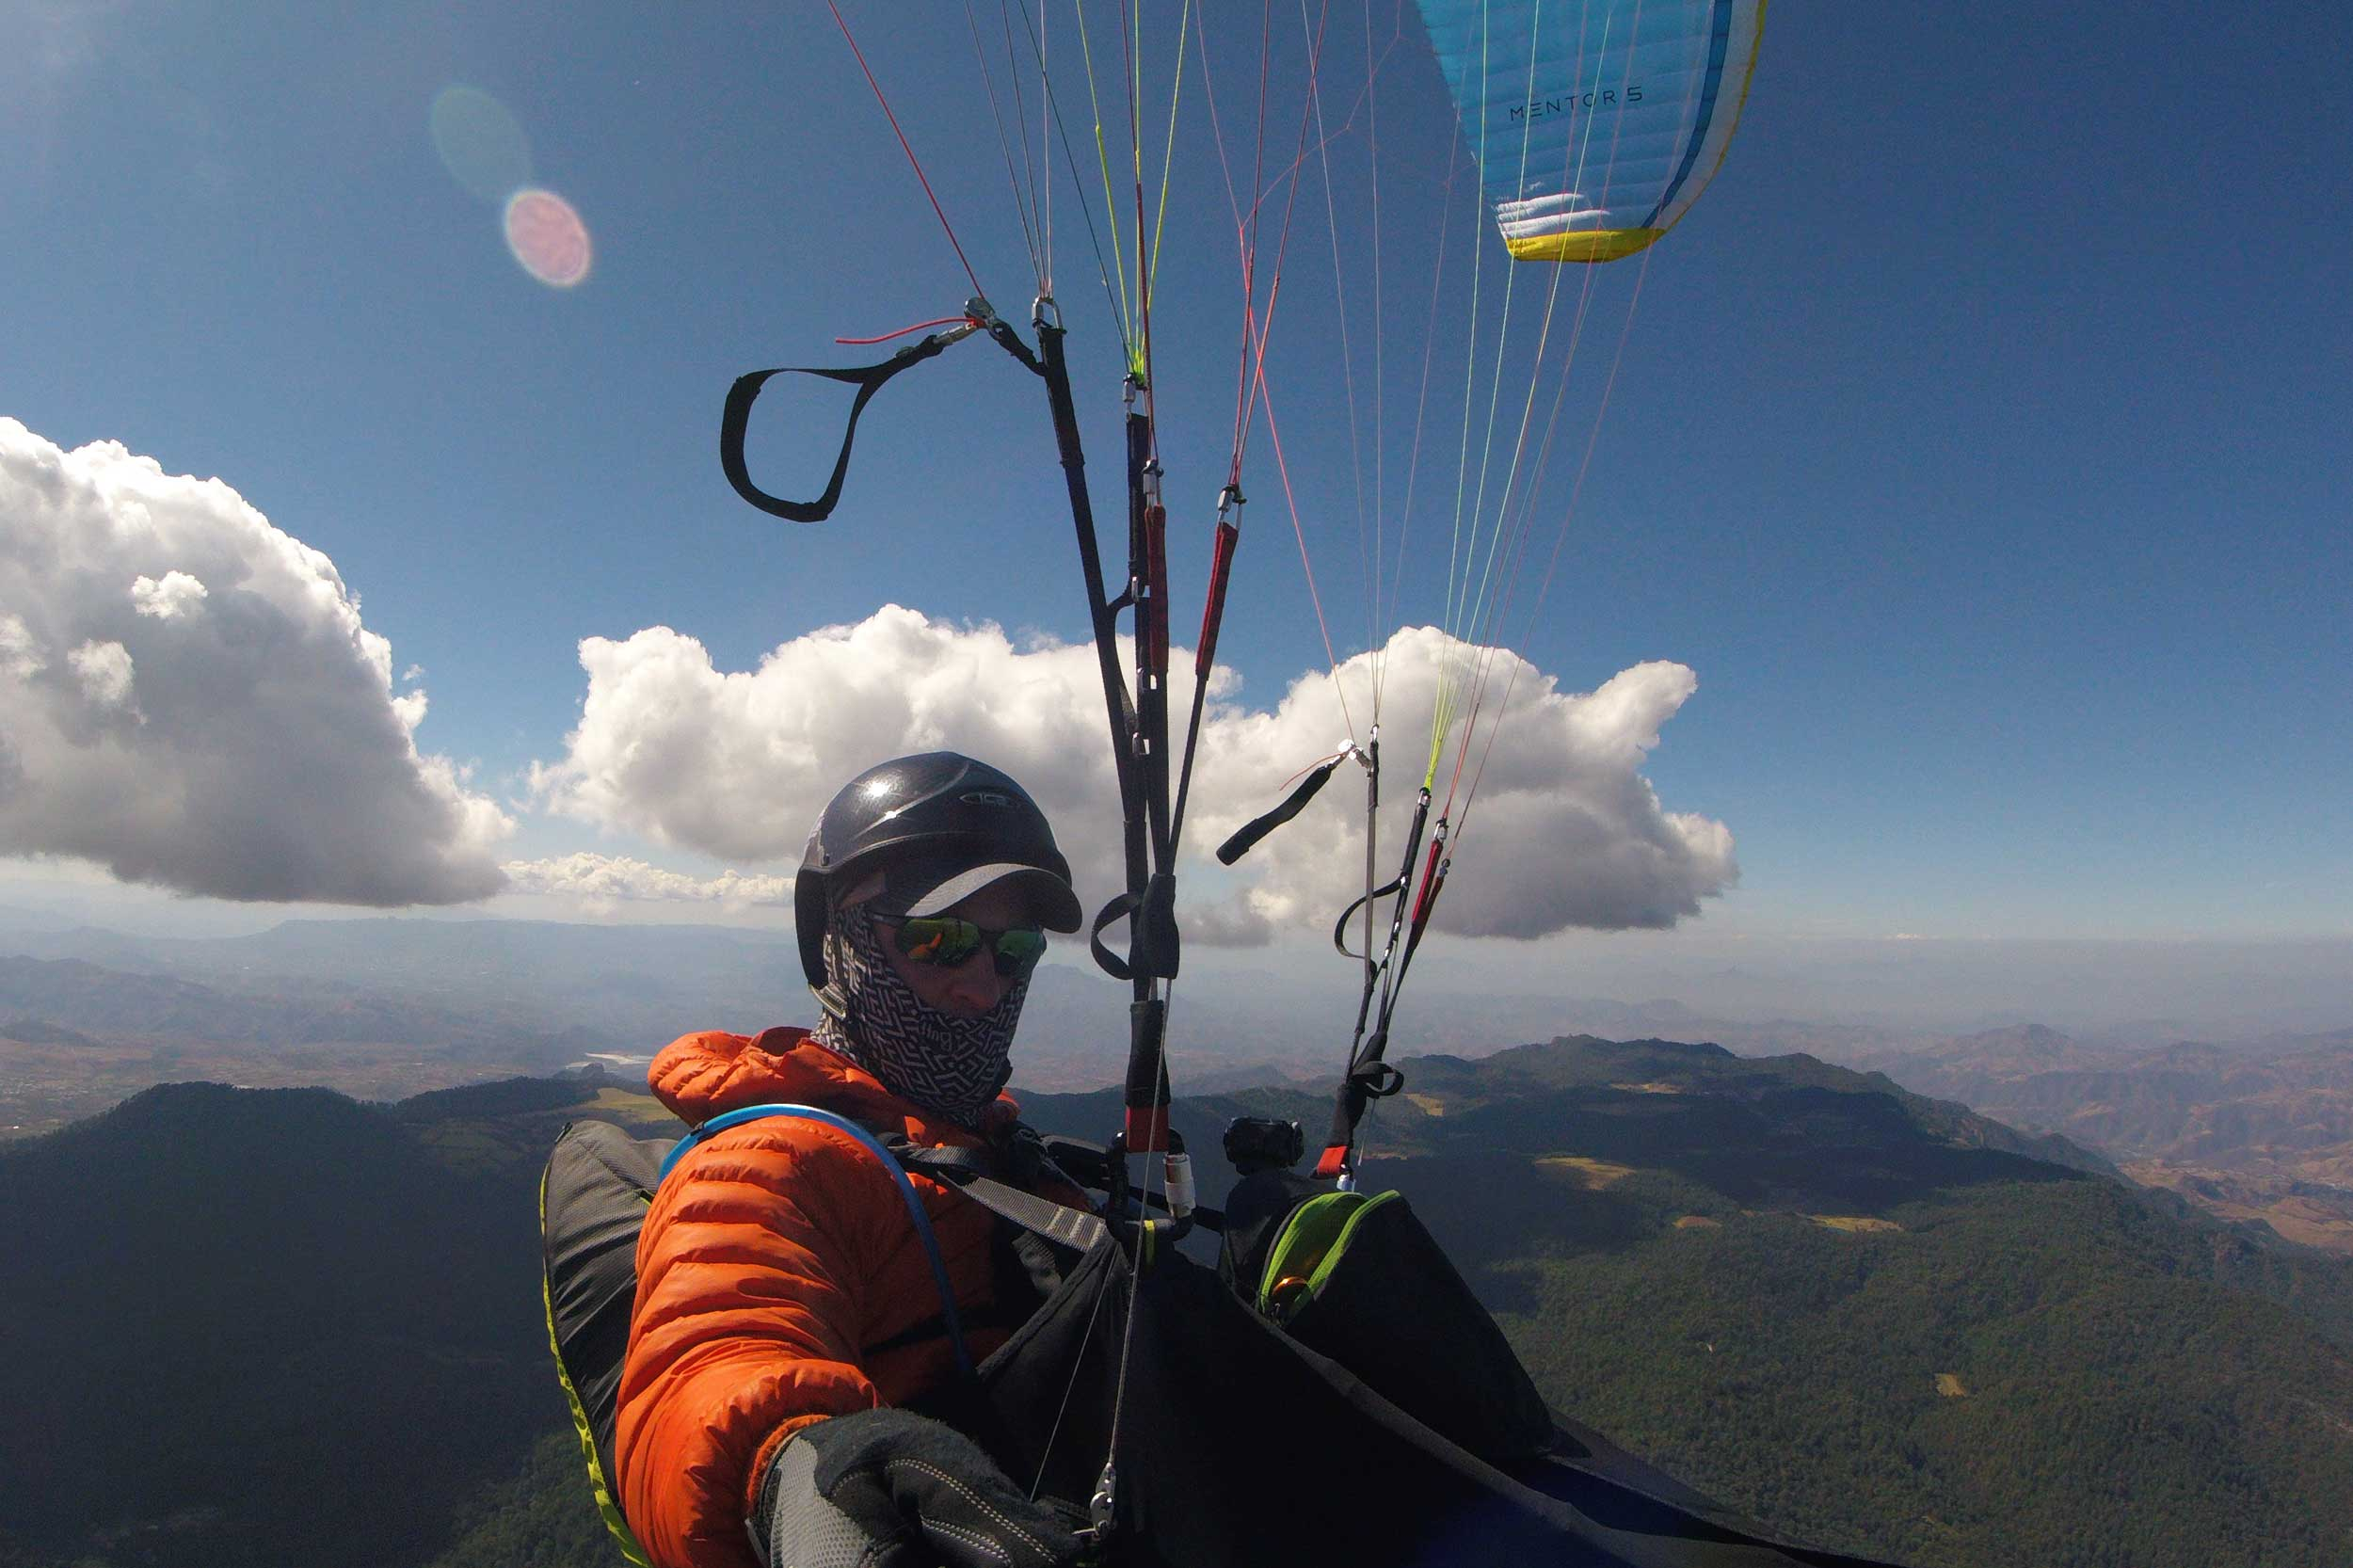 Paraglide-New-England-Trips-Valle-de-Bravo-Mexico-Gallery-Ryan-Lake-Run.jpg